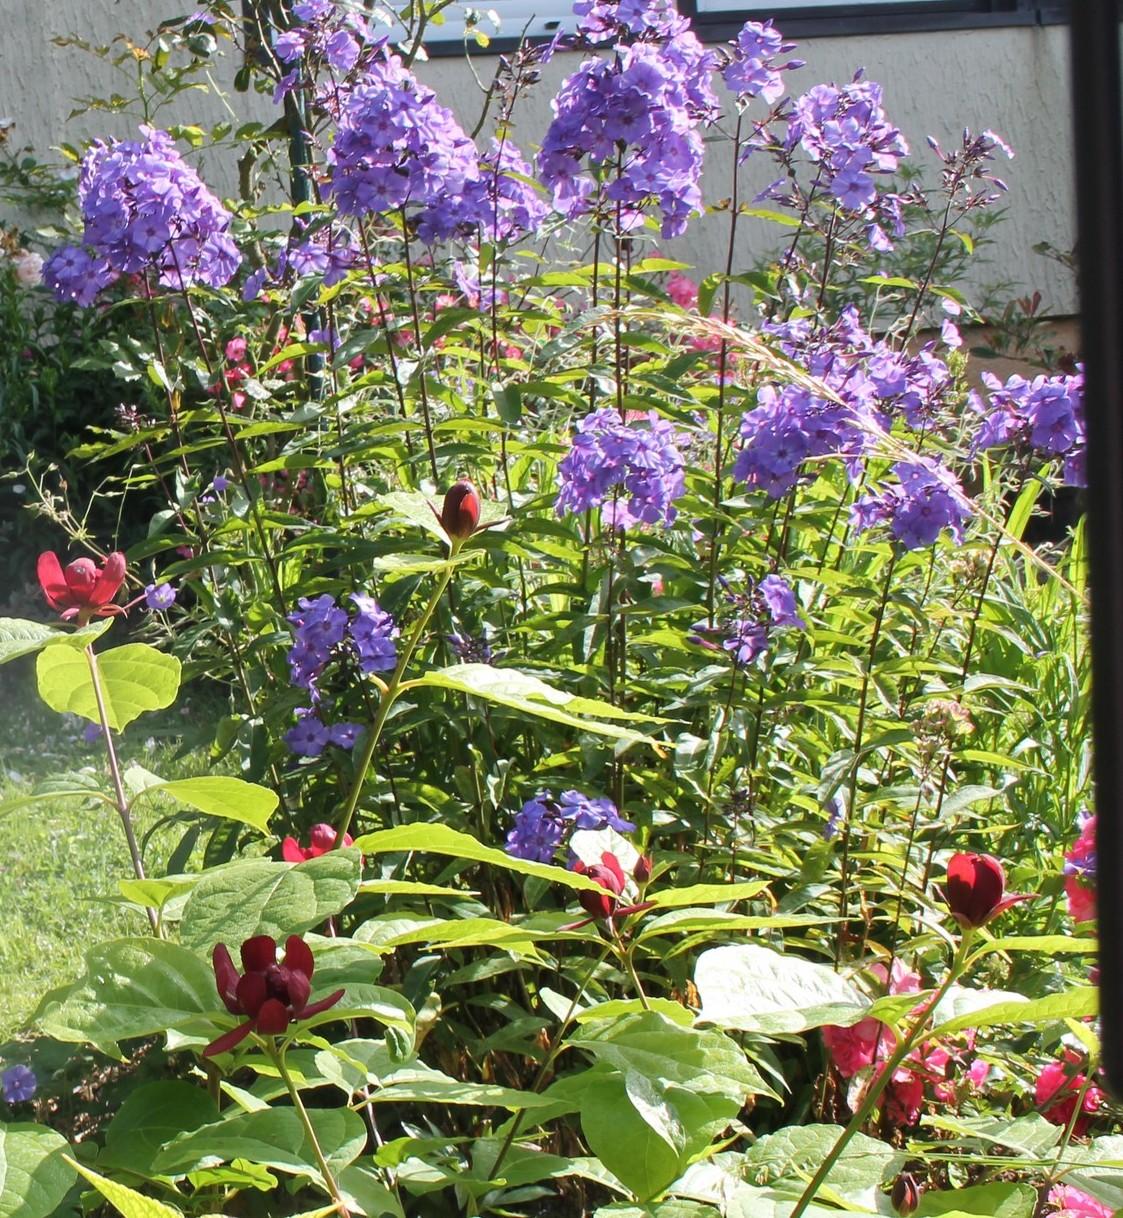 Doubs jardin petit tour au jardin 1 for Jardin 5 juillet biskra